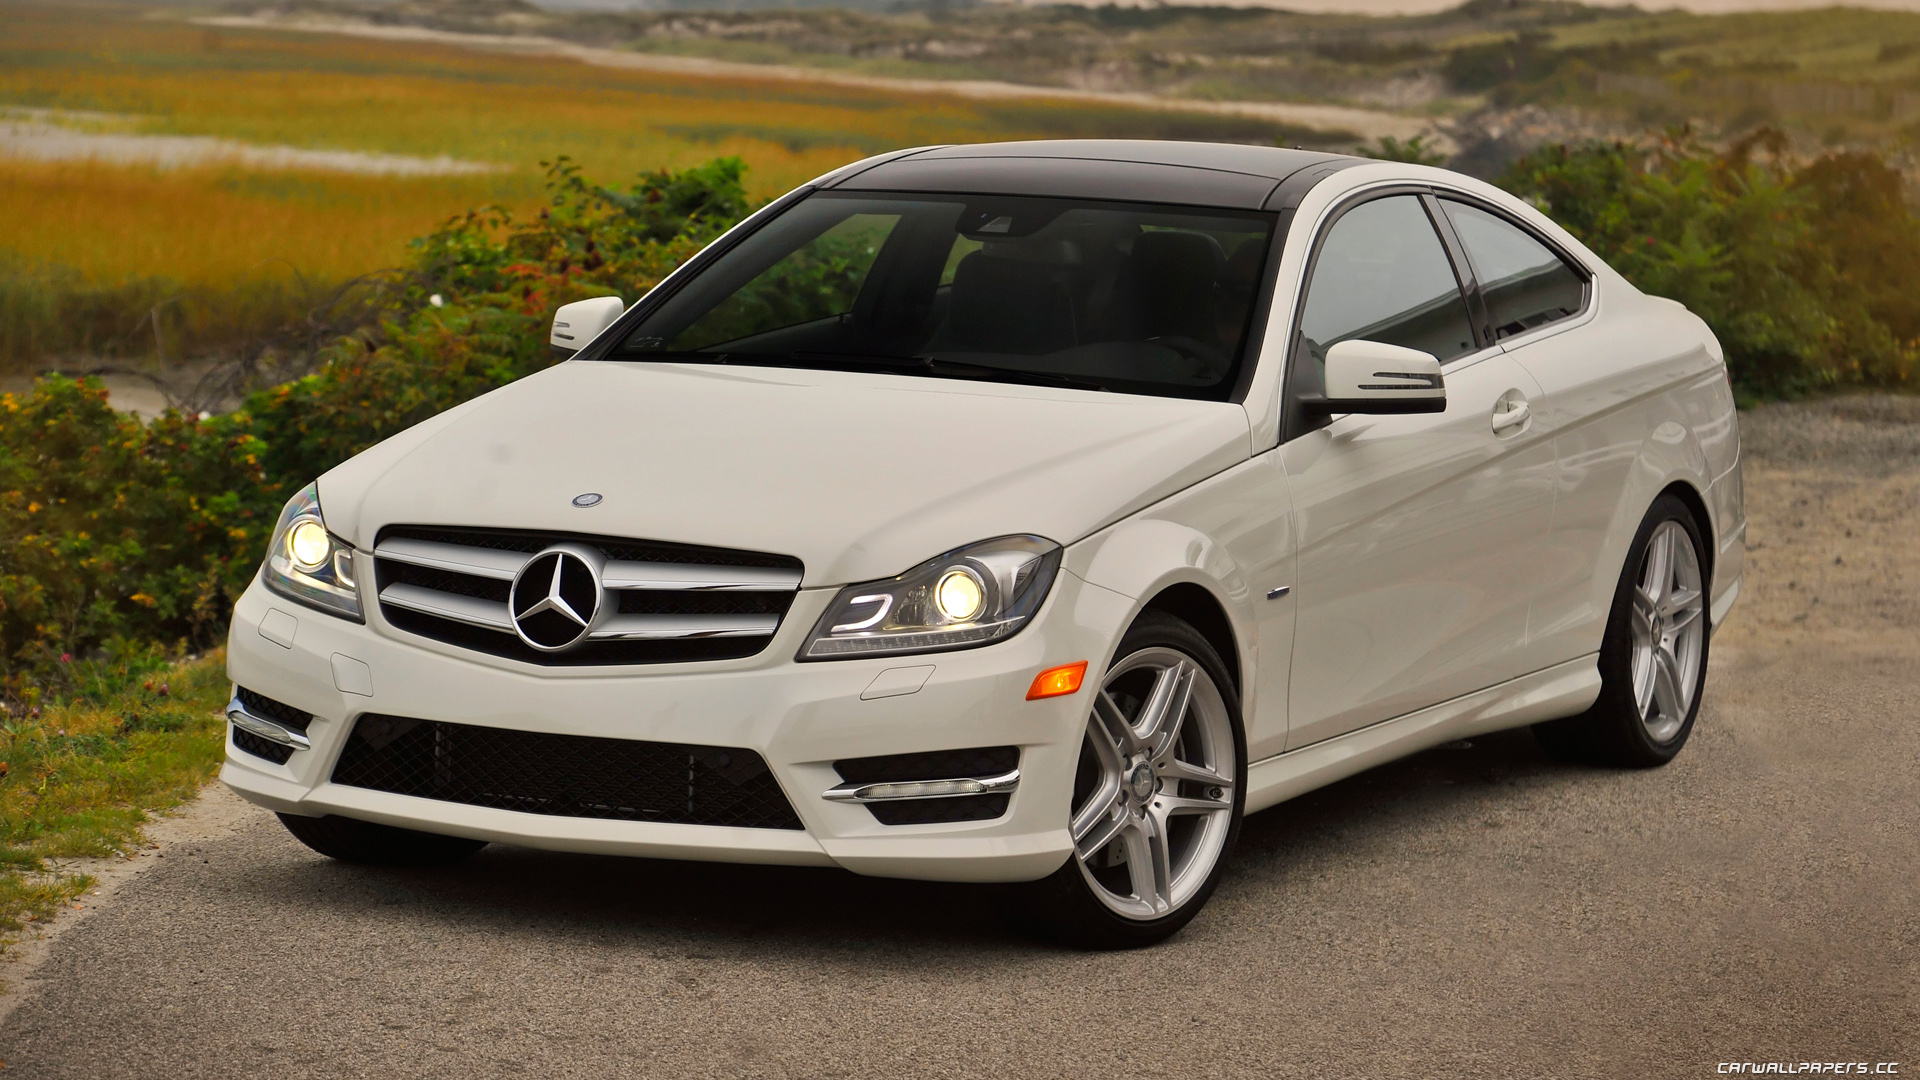 Mercedes Benz Wallpapers Download Finance Assit